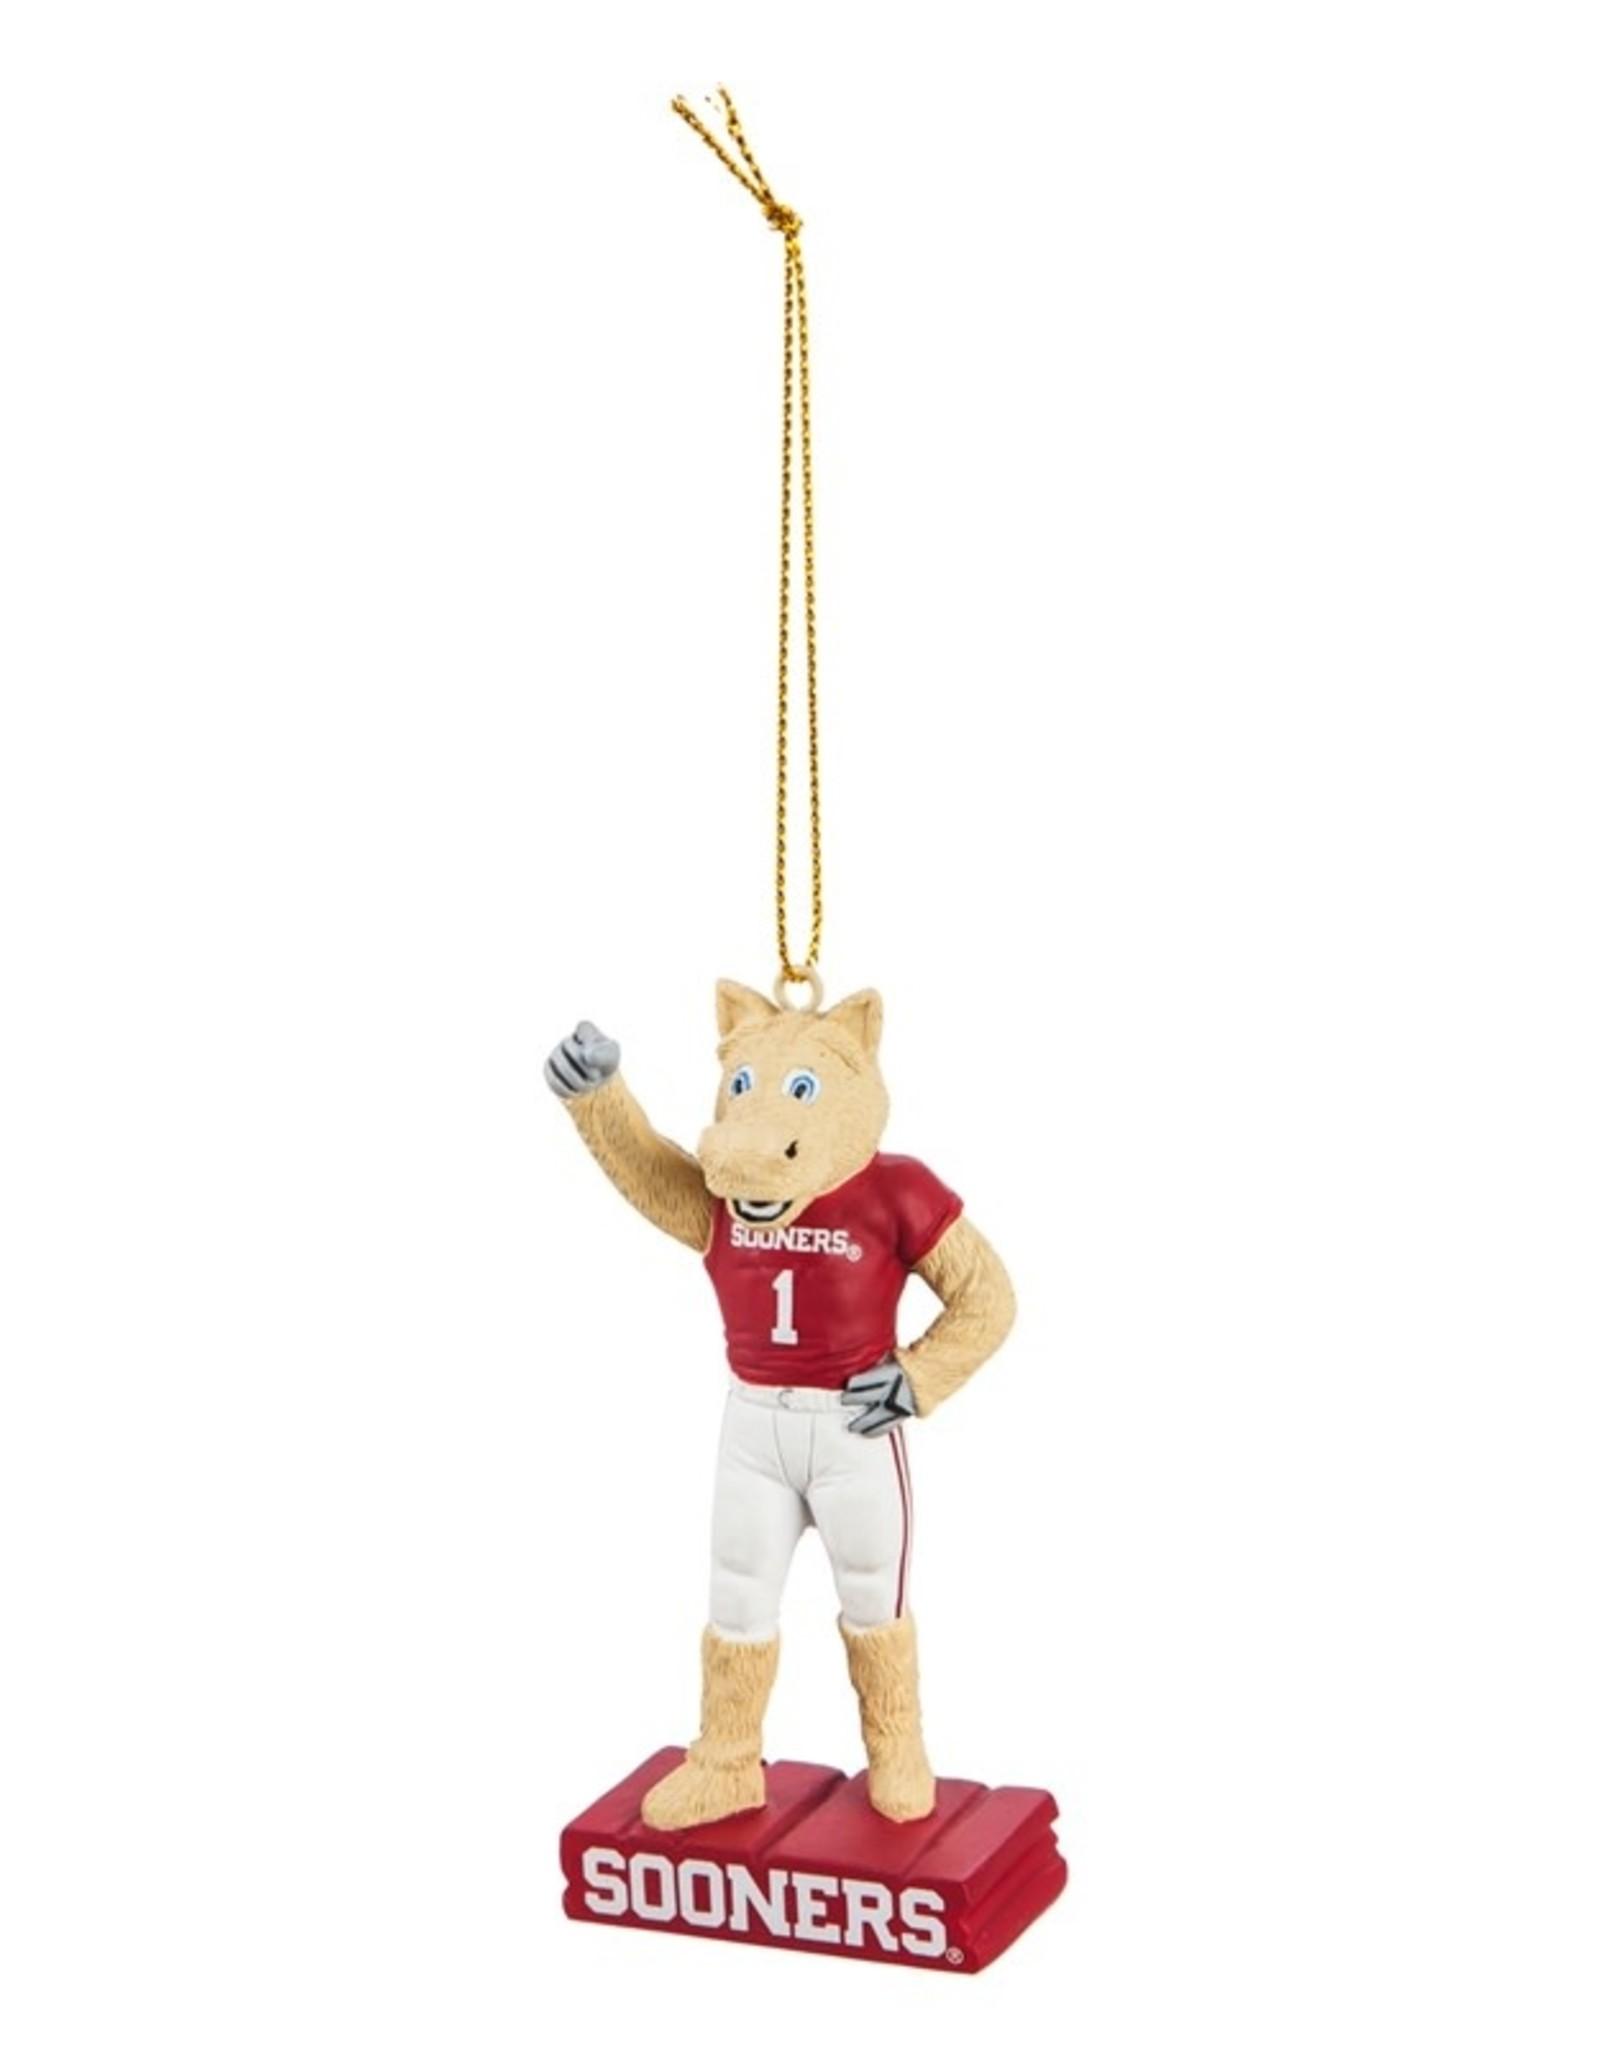 Team Sports America Mascot Statue Ornament